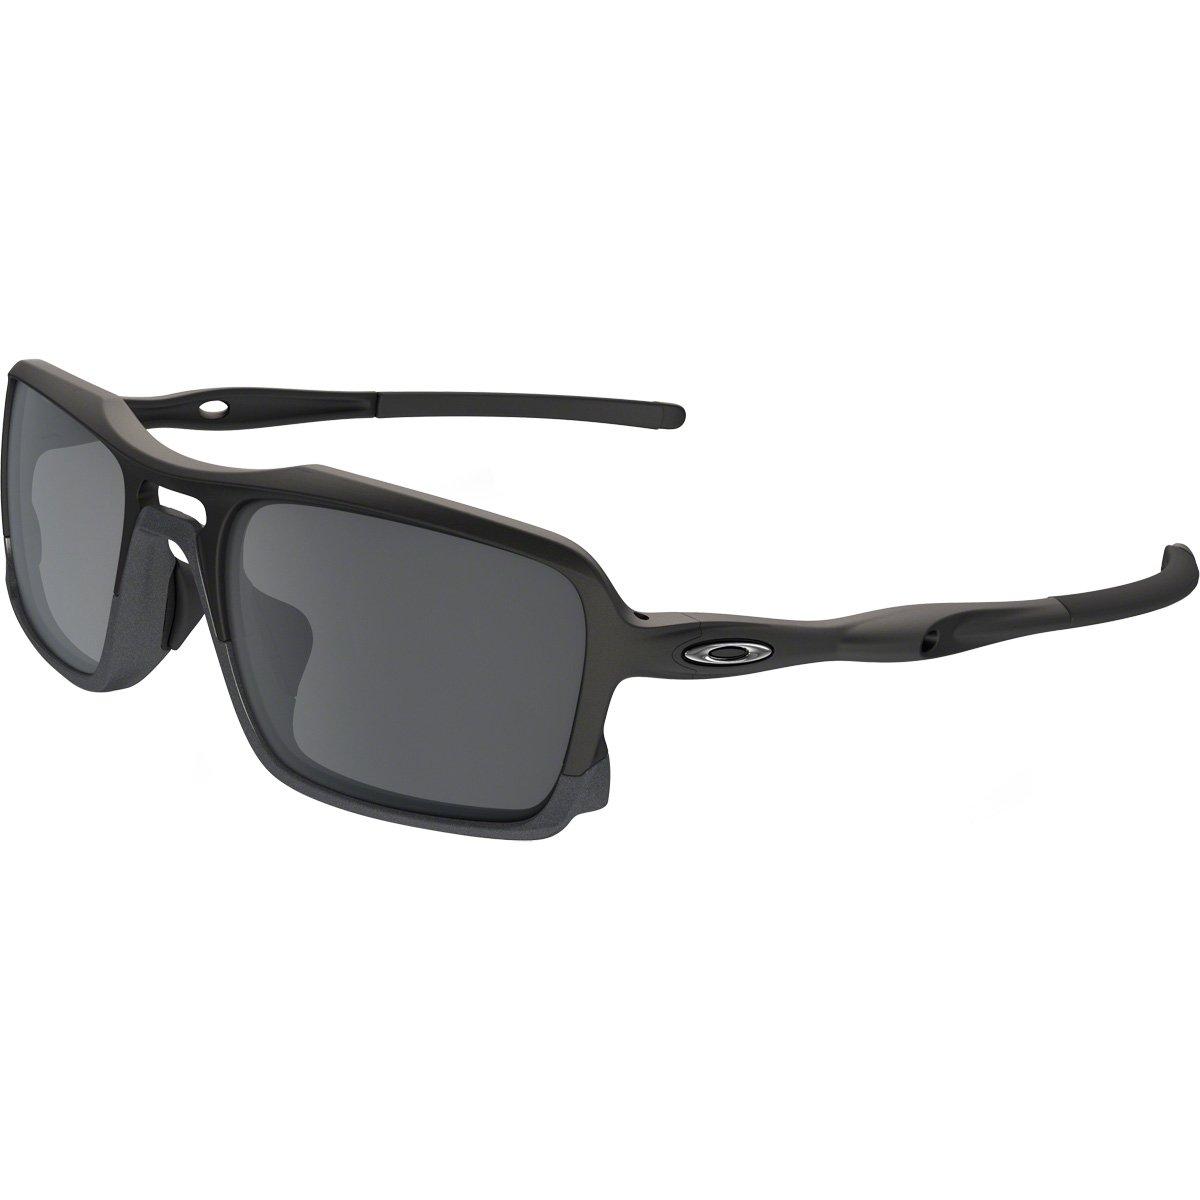 Oakley Men's OO9266 Triggerman Rectangular Sunglasses, Matte Black/Black Iridium, 59 mm by Oakley